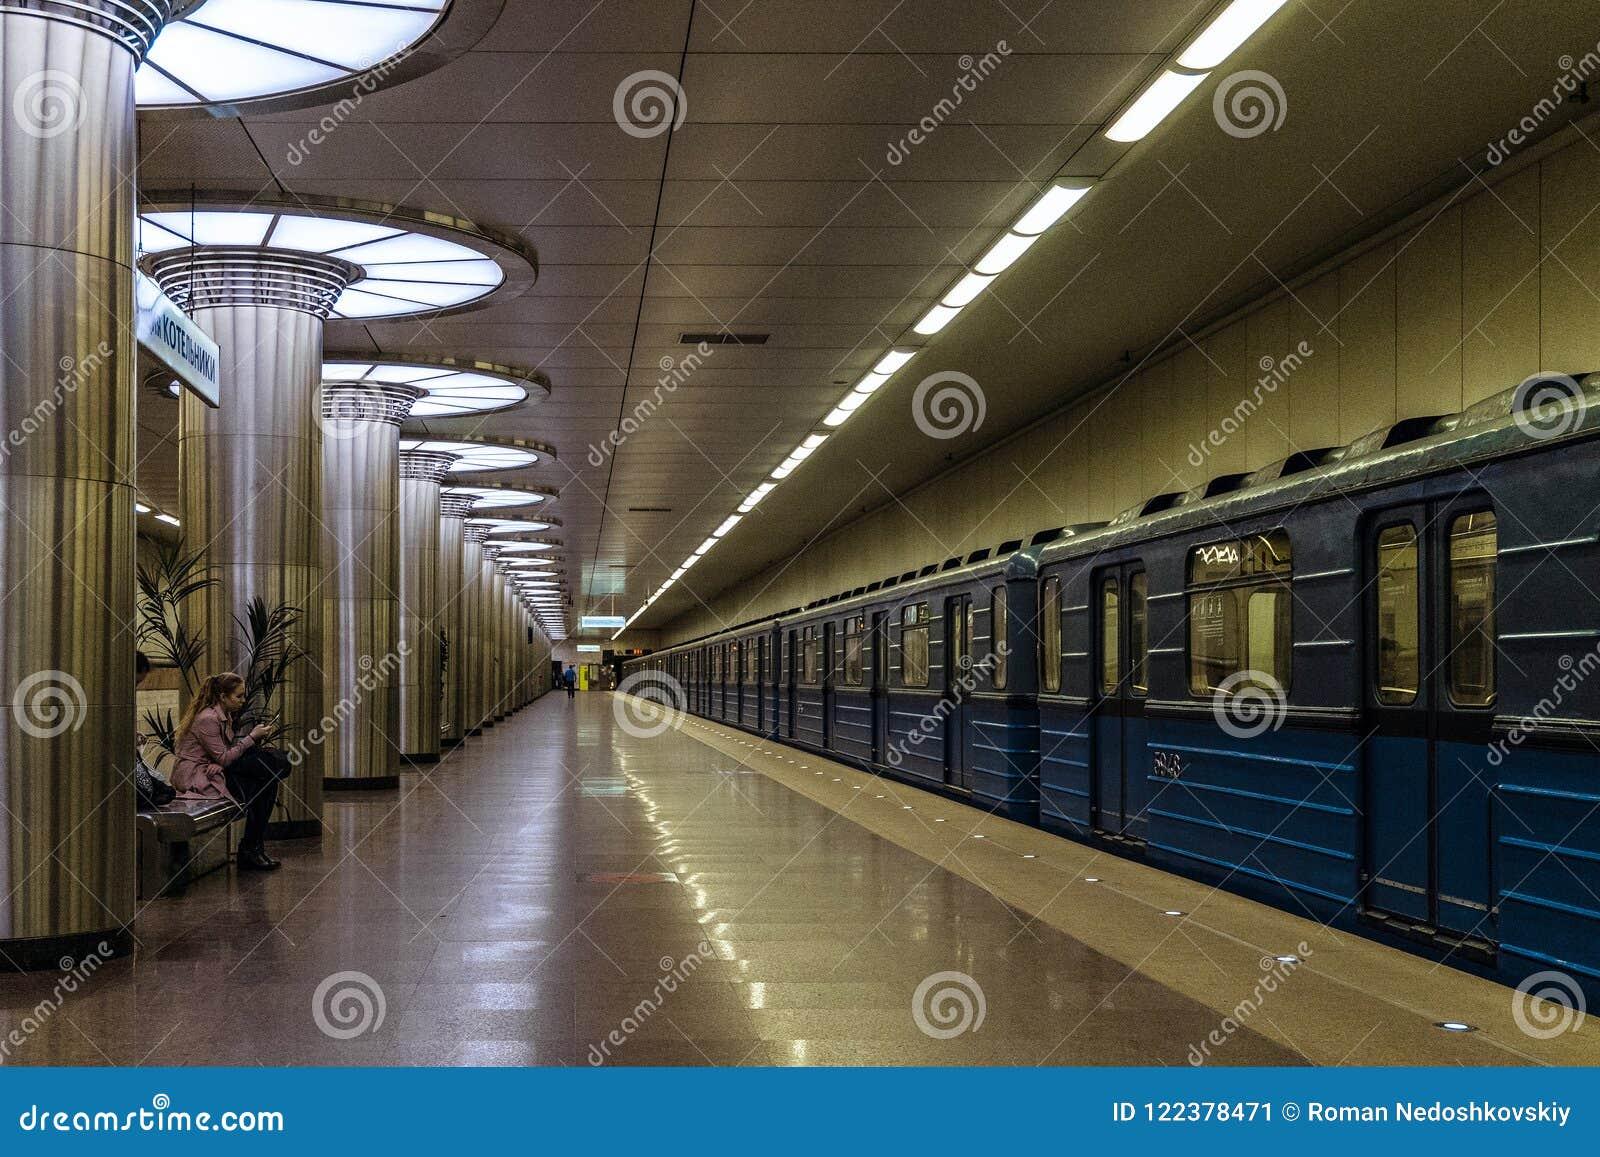 How to get from metro Kotelniki to Lyubertsy 7